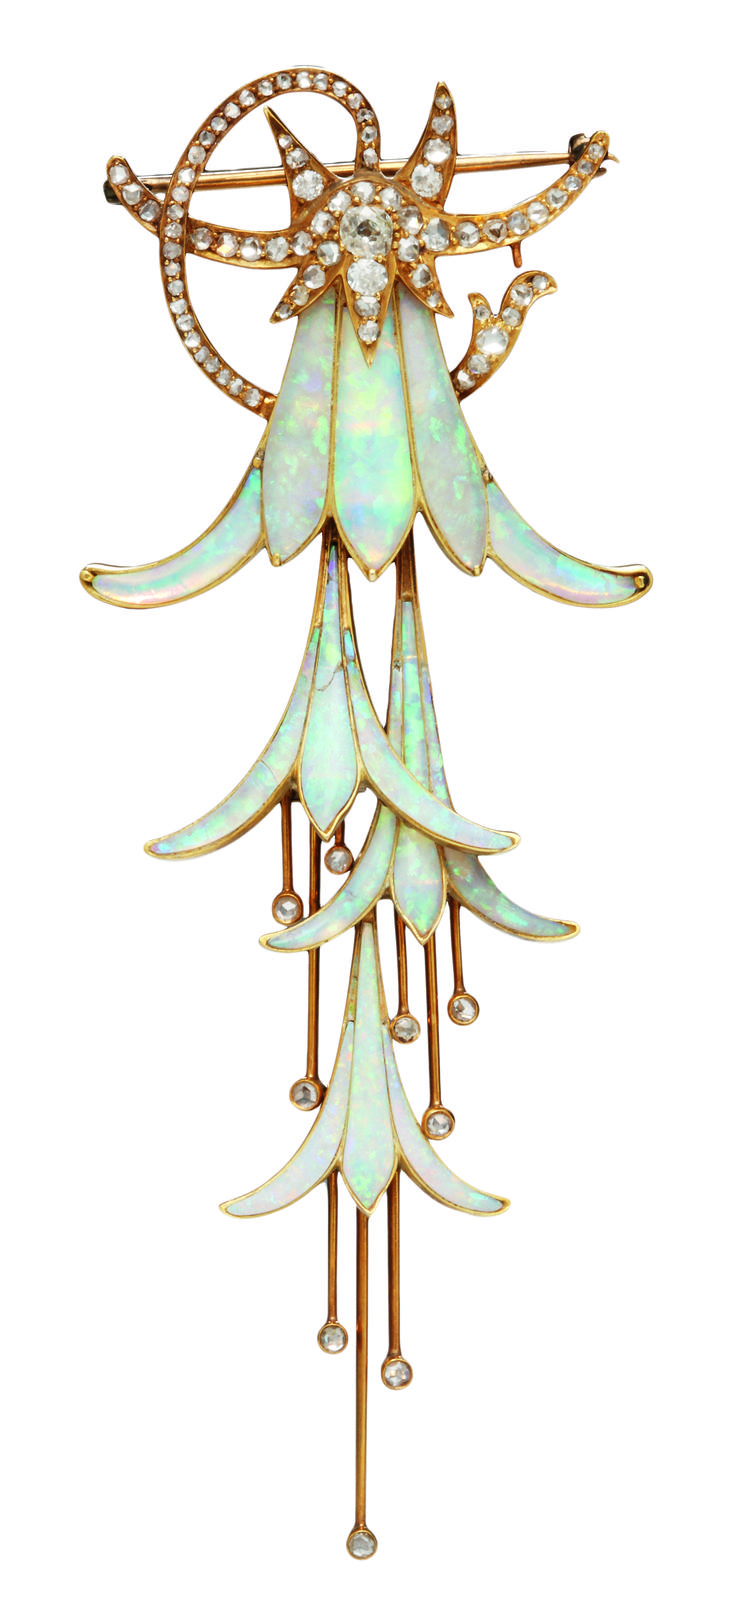 Georges Fouquet fuchsia brooch - 1902 - Paris - Hessisches Landesmuseum Darmstadt - Art Nouveau